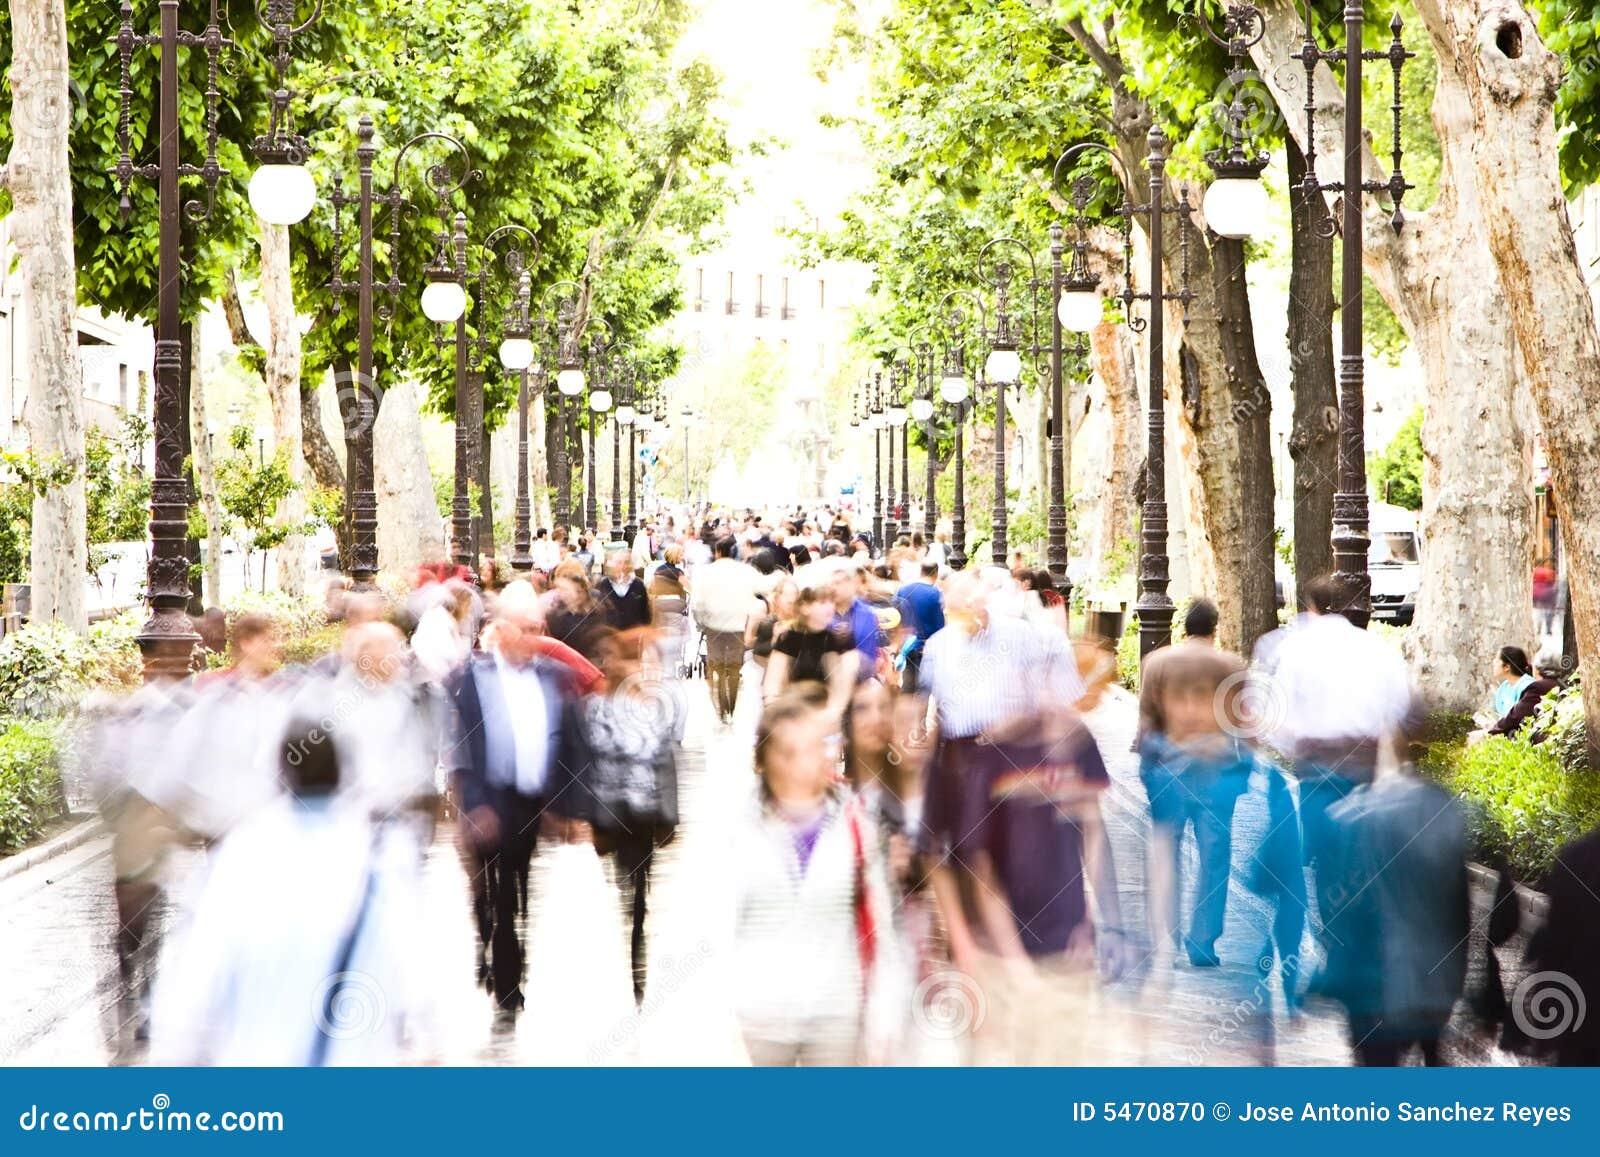 Blurred People Stock Photo - Image: 5470870